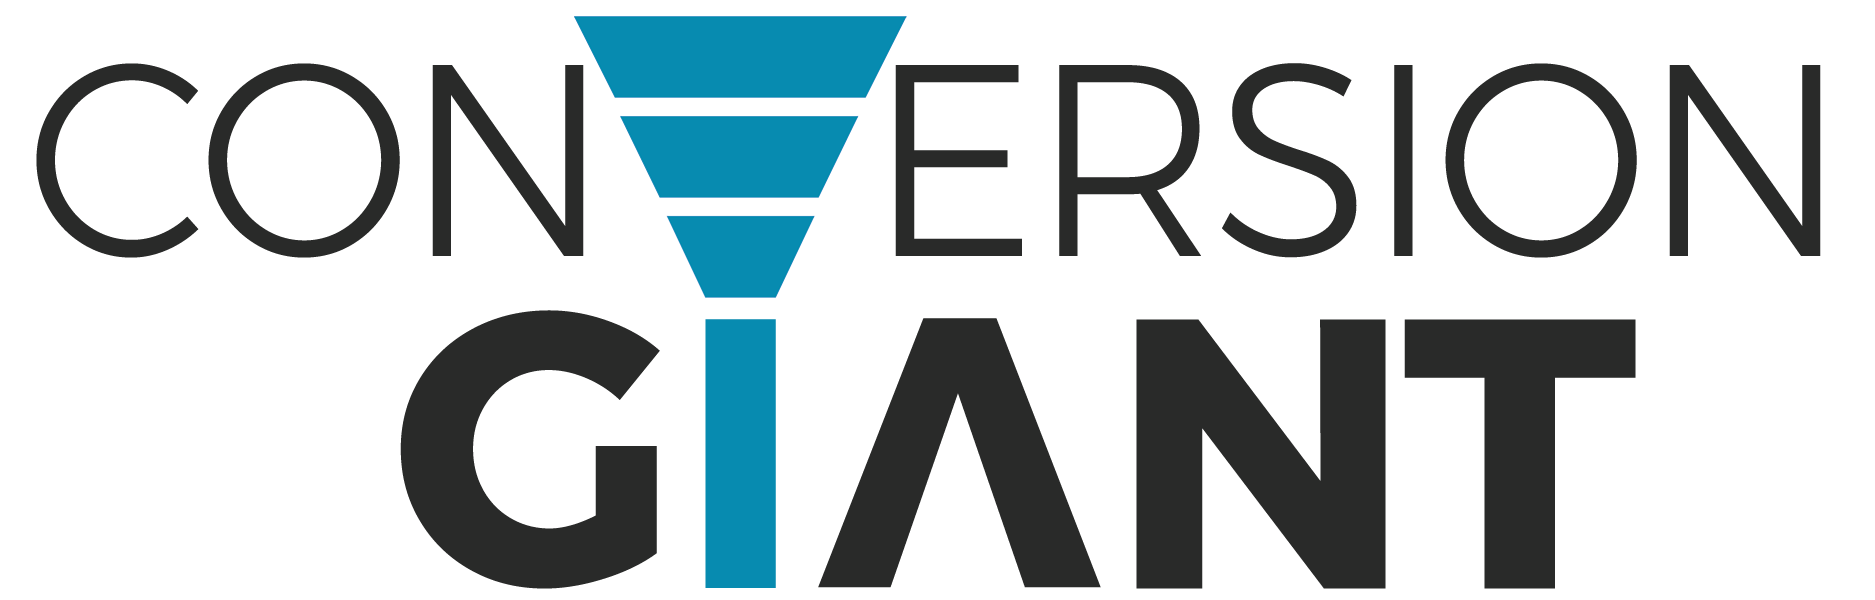 Conversion Giant Logo